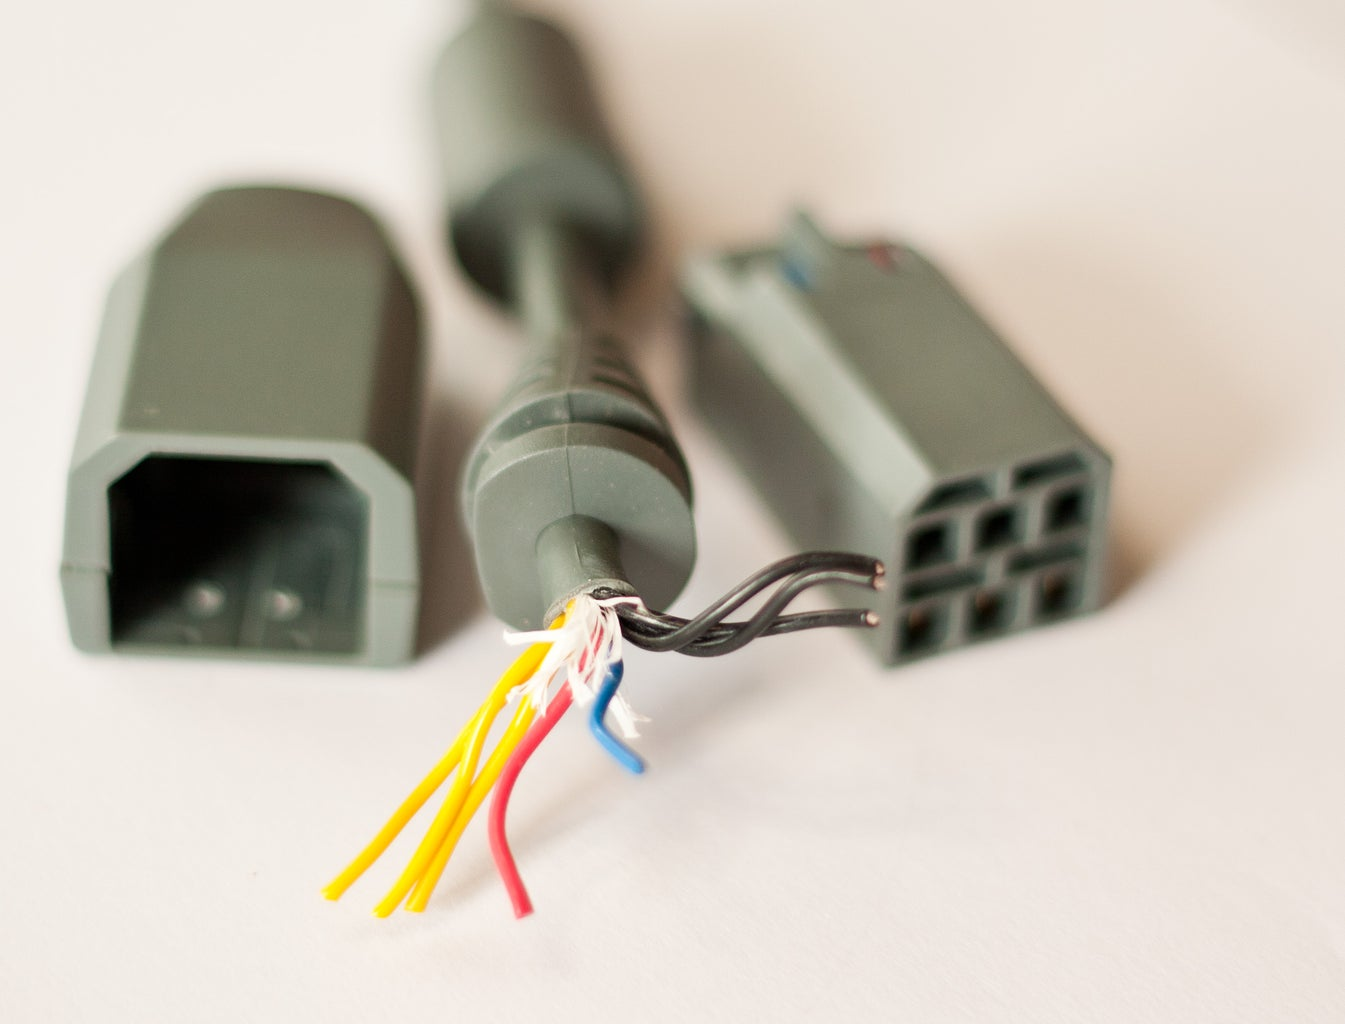 Crack the Plug